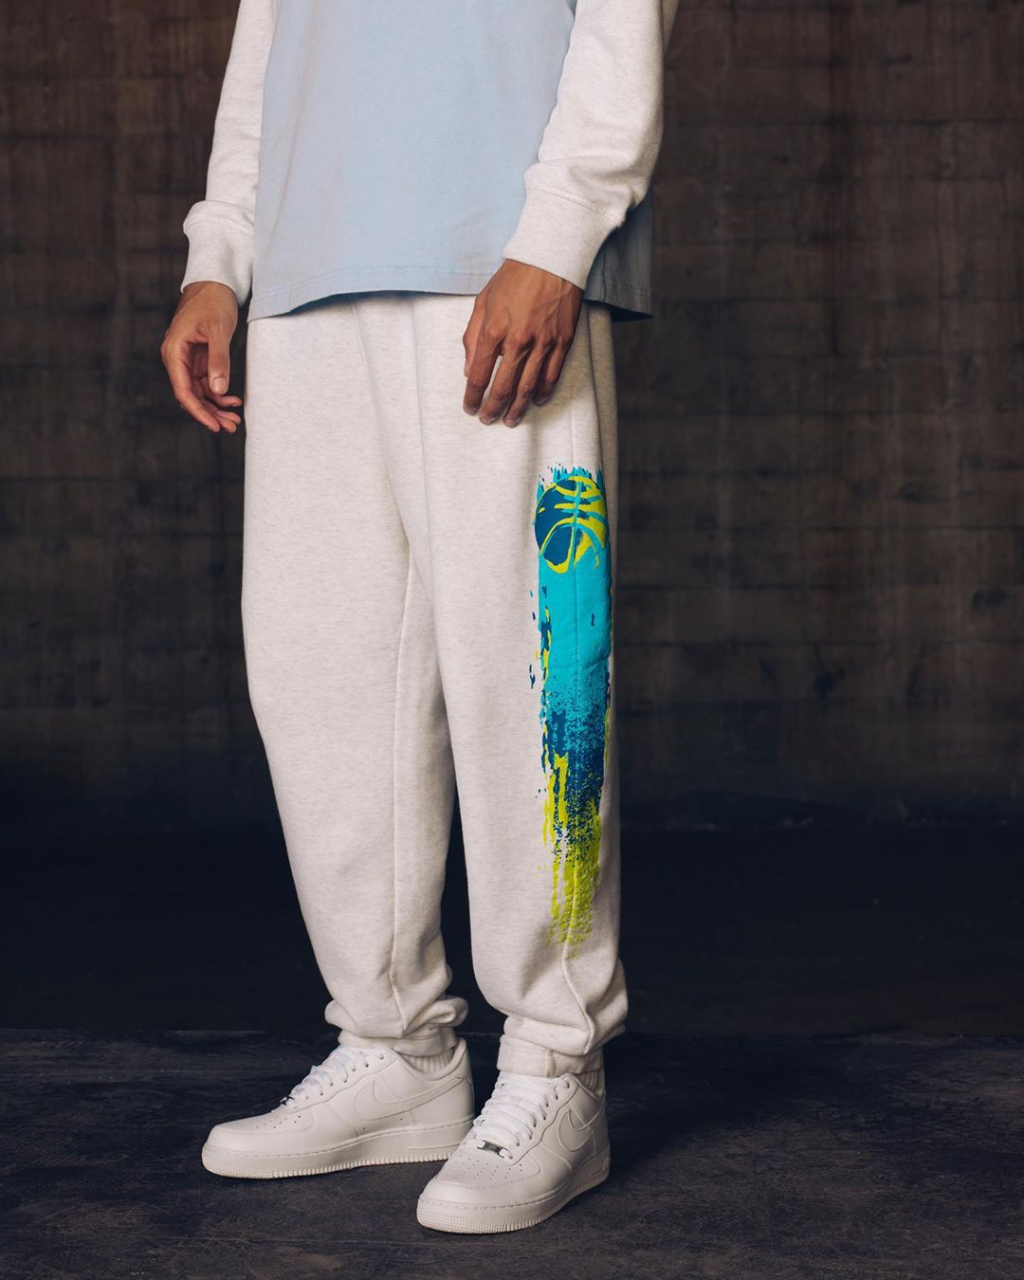 union-jordan-brand-second-collaboration-item-release-20190802